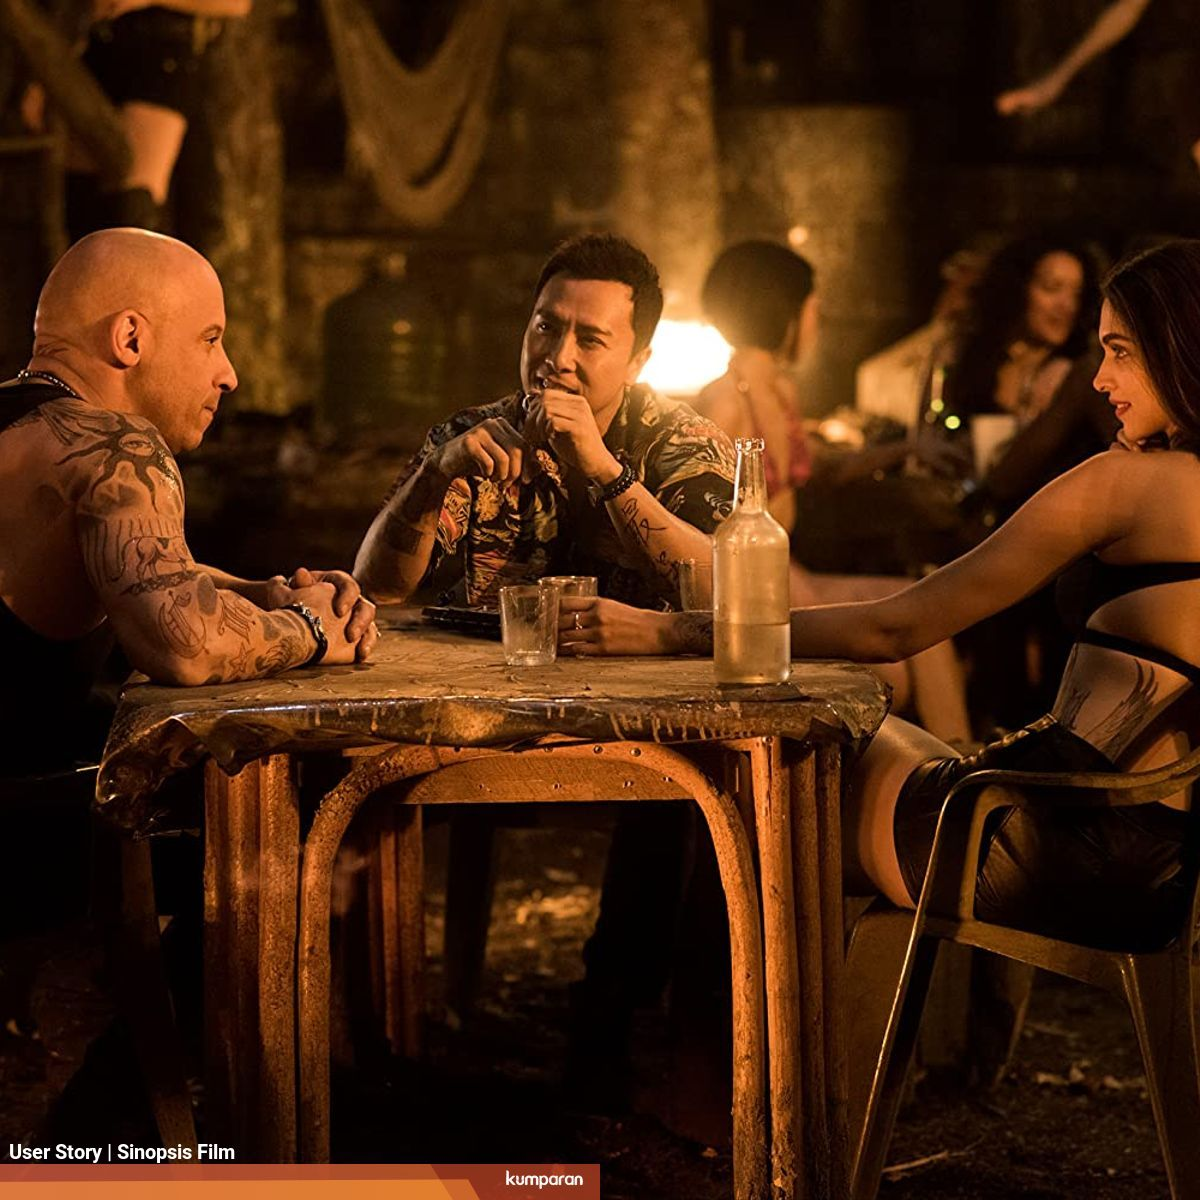 Sinopsis Film Xxx Return Of Xander Cage Tayang Malam Ini Di Bioskop Trans Tv Kumparan Com